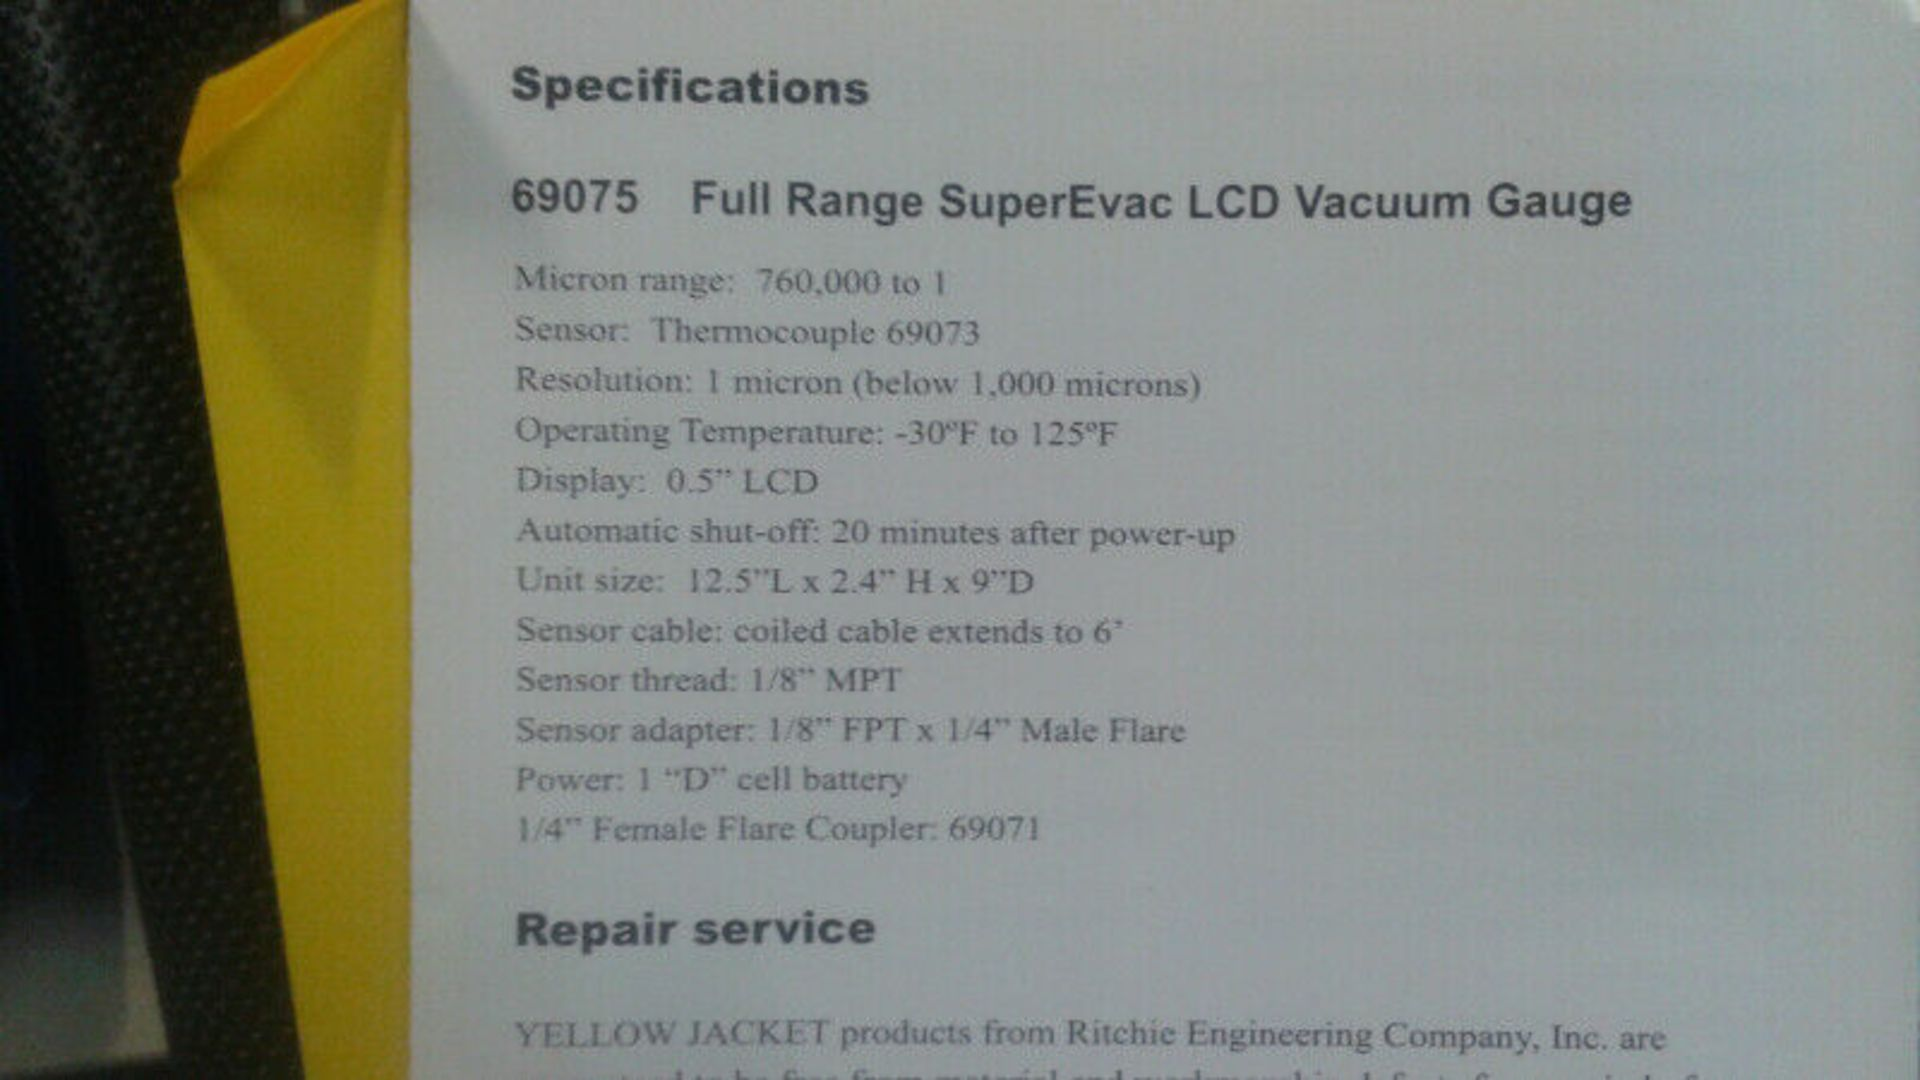 Yellow Jacket Supervac LCD Vacuum Gauge, Mdl 69075 - LOCATION - LONDON, ONTARIO - Image 2 of 2